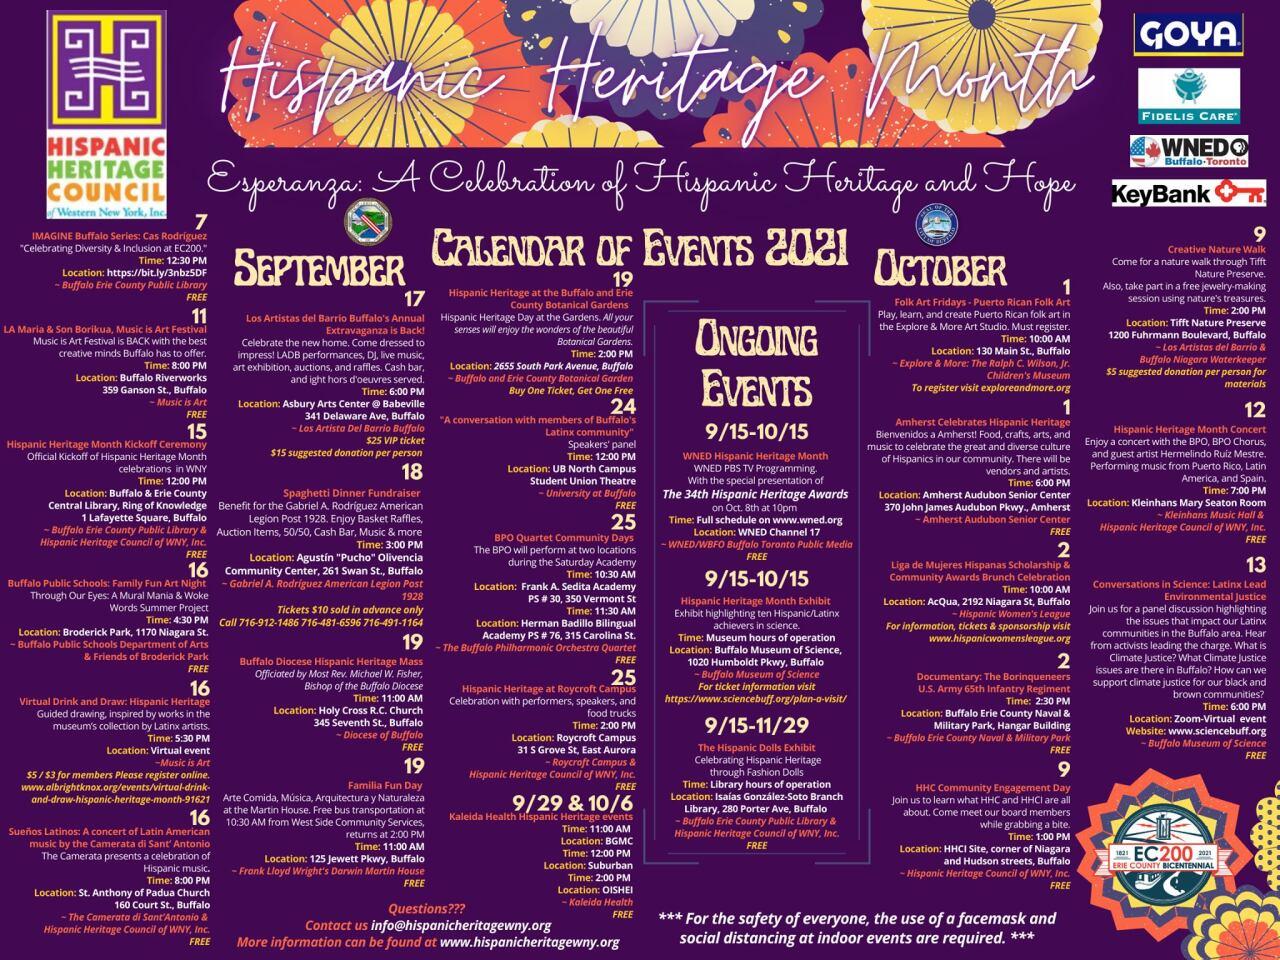 Full list of 2021 Hispanic Heritage Month events